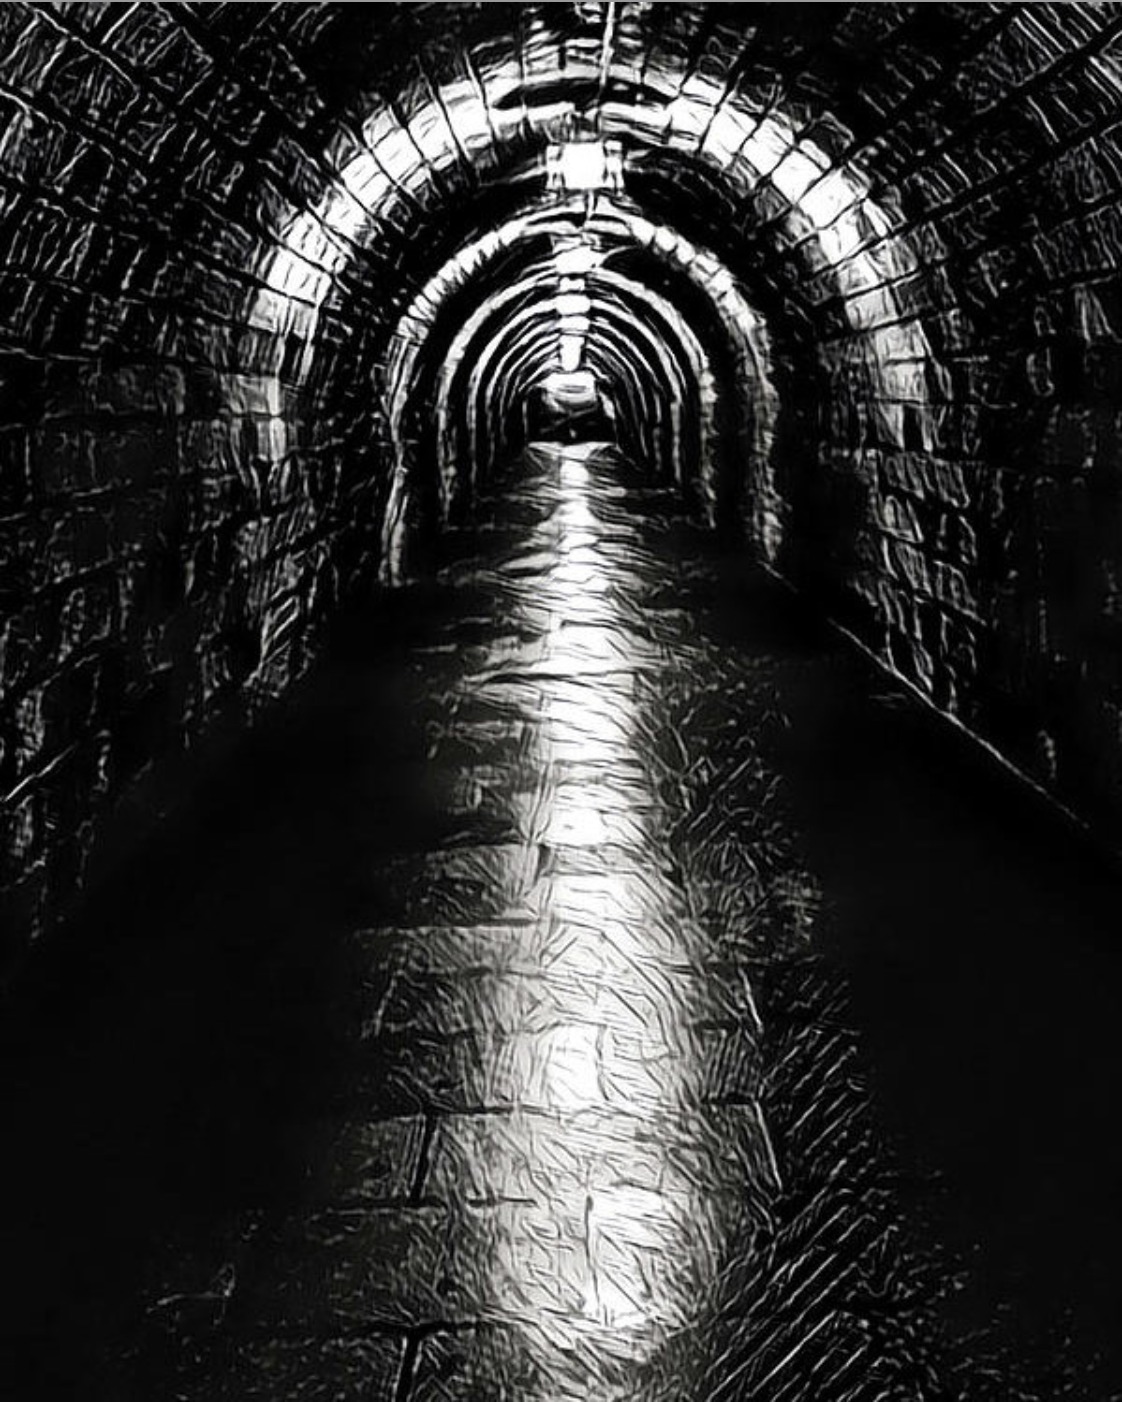 темные туннели картинки один